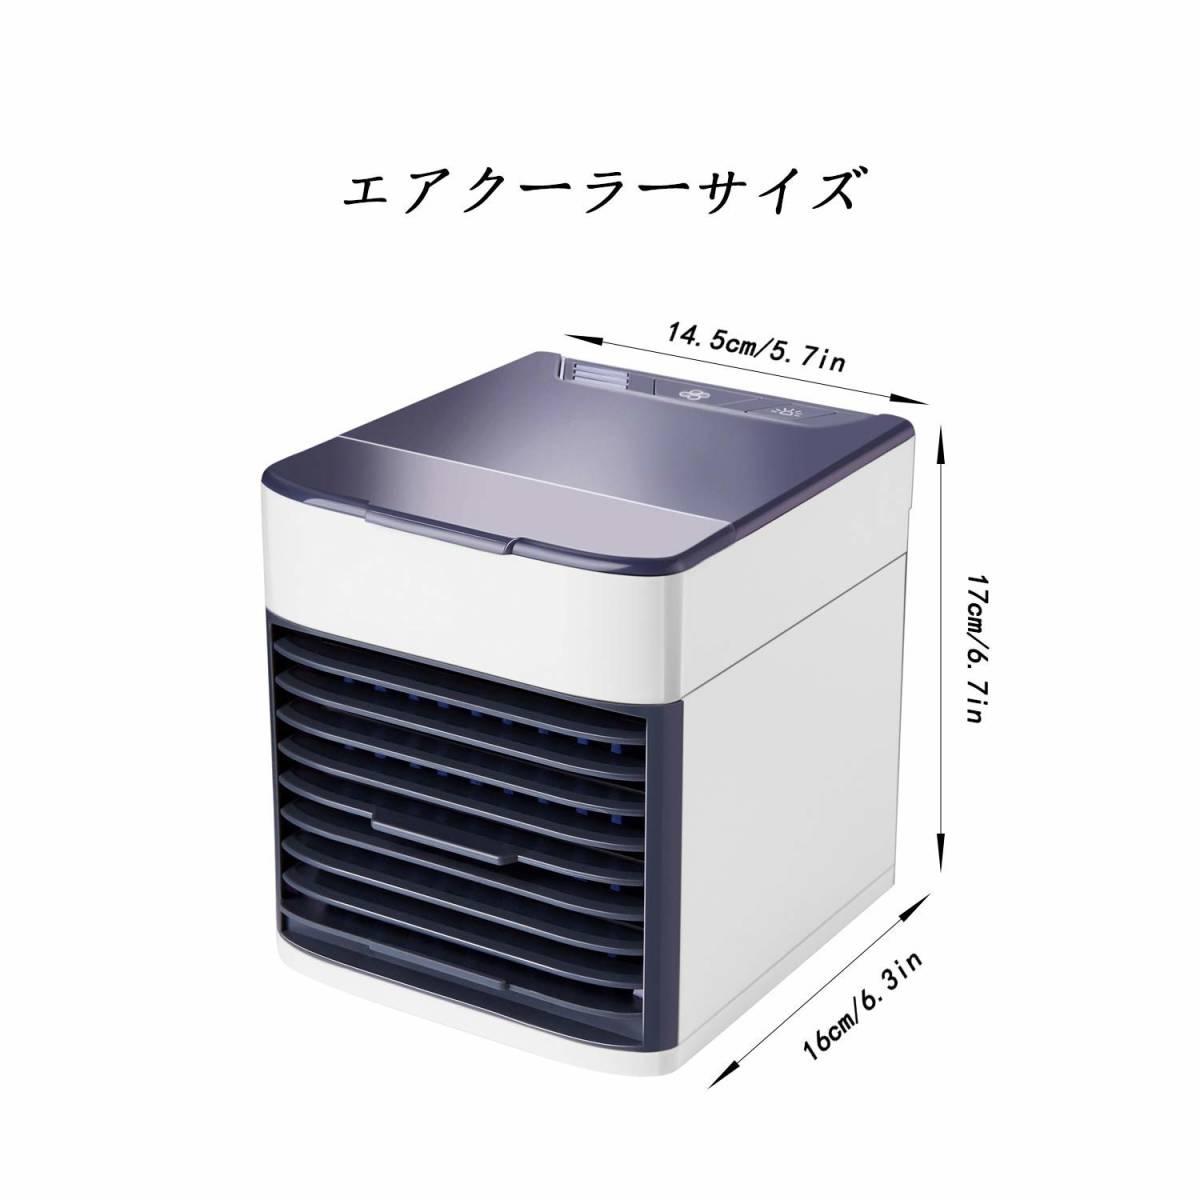 【最新版2019】【新品】Winhi 卓上扇風機 冷風扇風機 卓上冷風扇 最新バージョン コンパクト 風量3段階 小型 気化式冷風機 強風 加湿機能_画像2